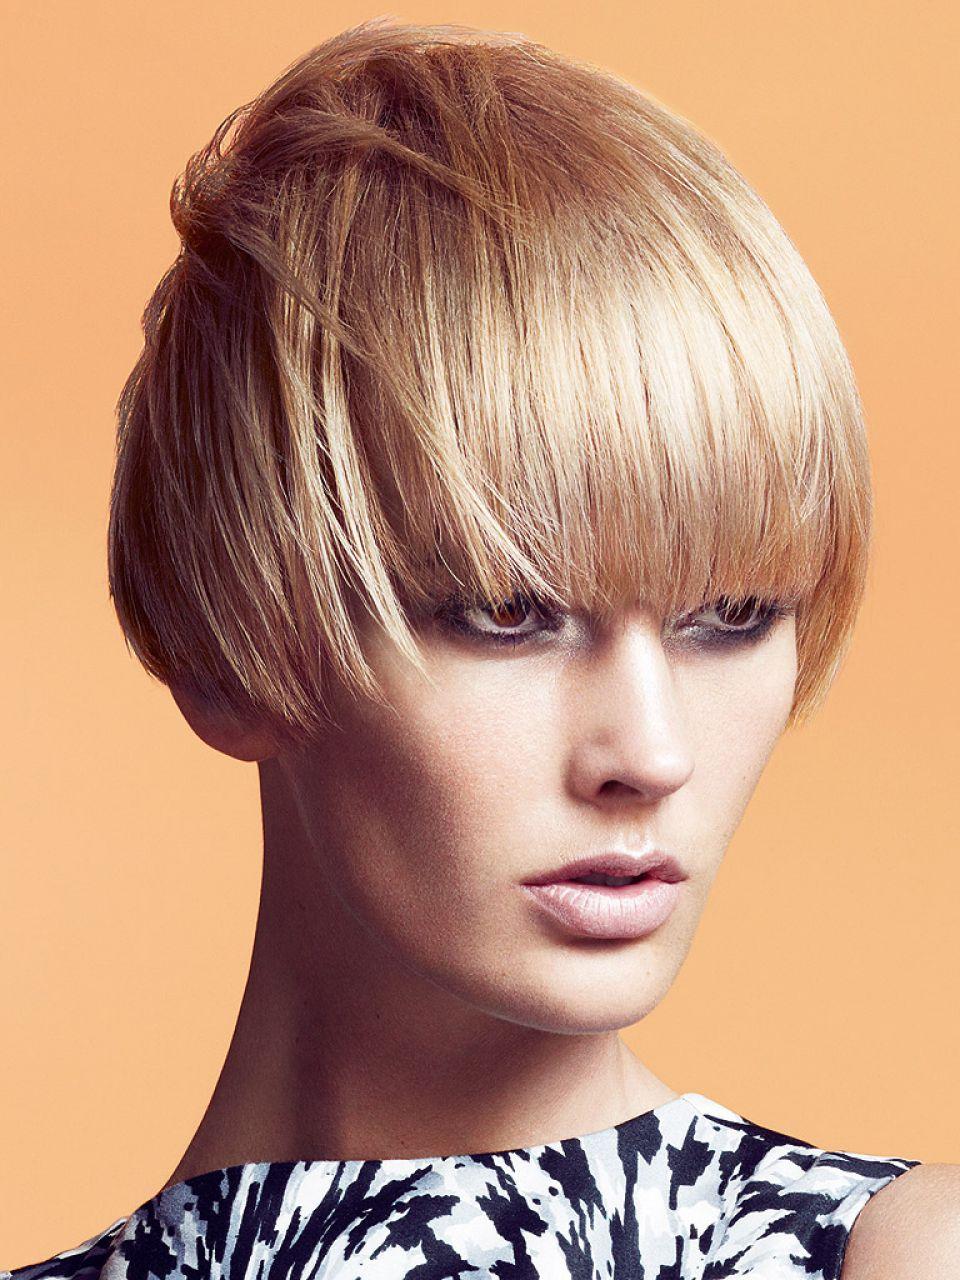 Unsere top 25 blonde mittellange frisuren platz 25 - Damen frisuren halblang ...